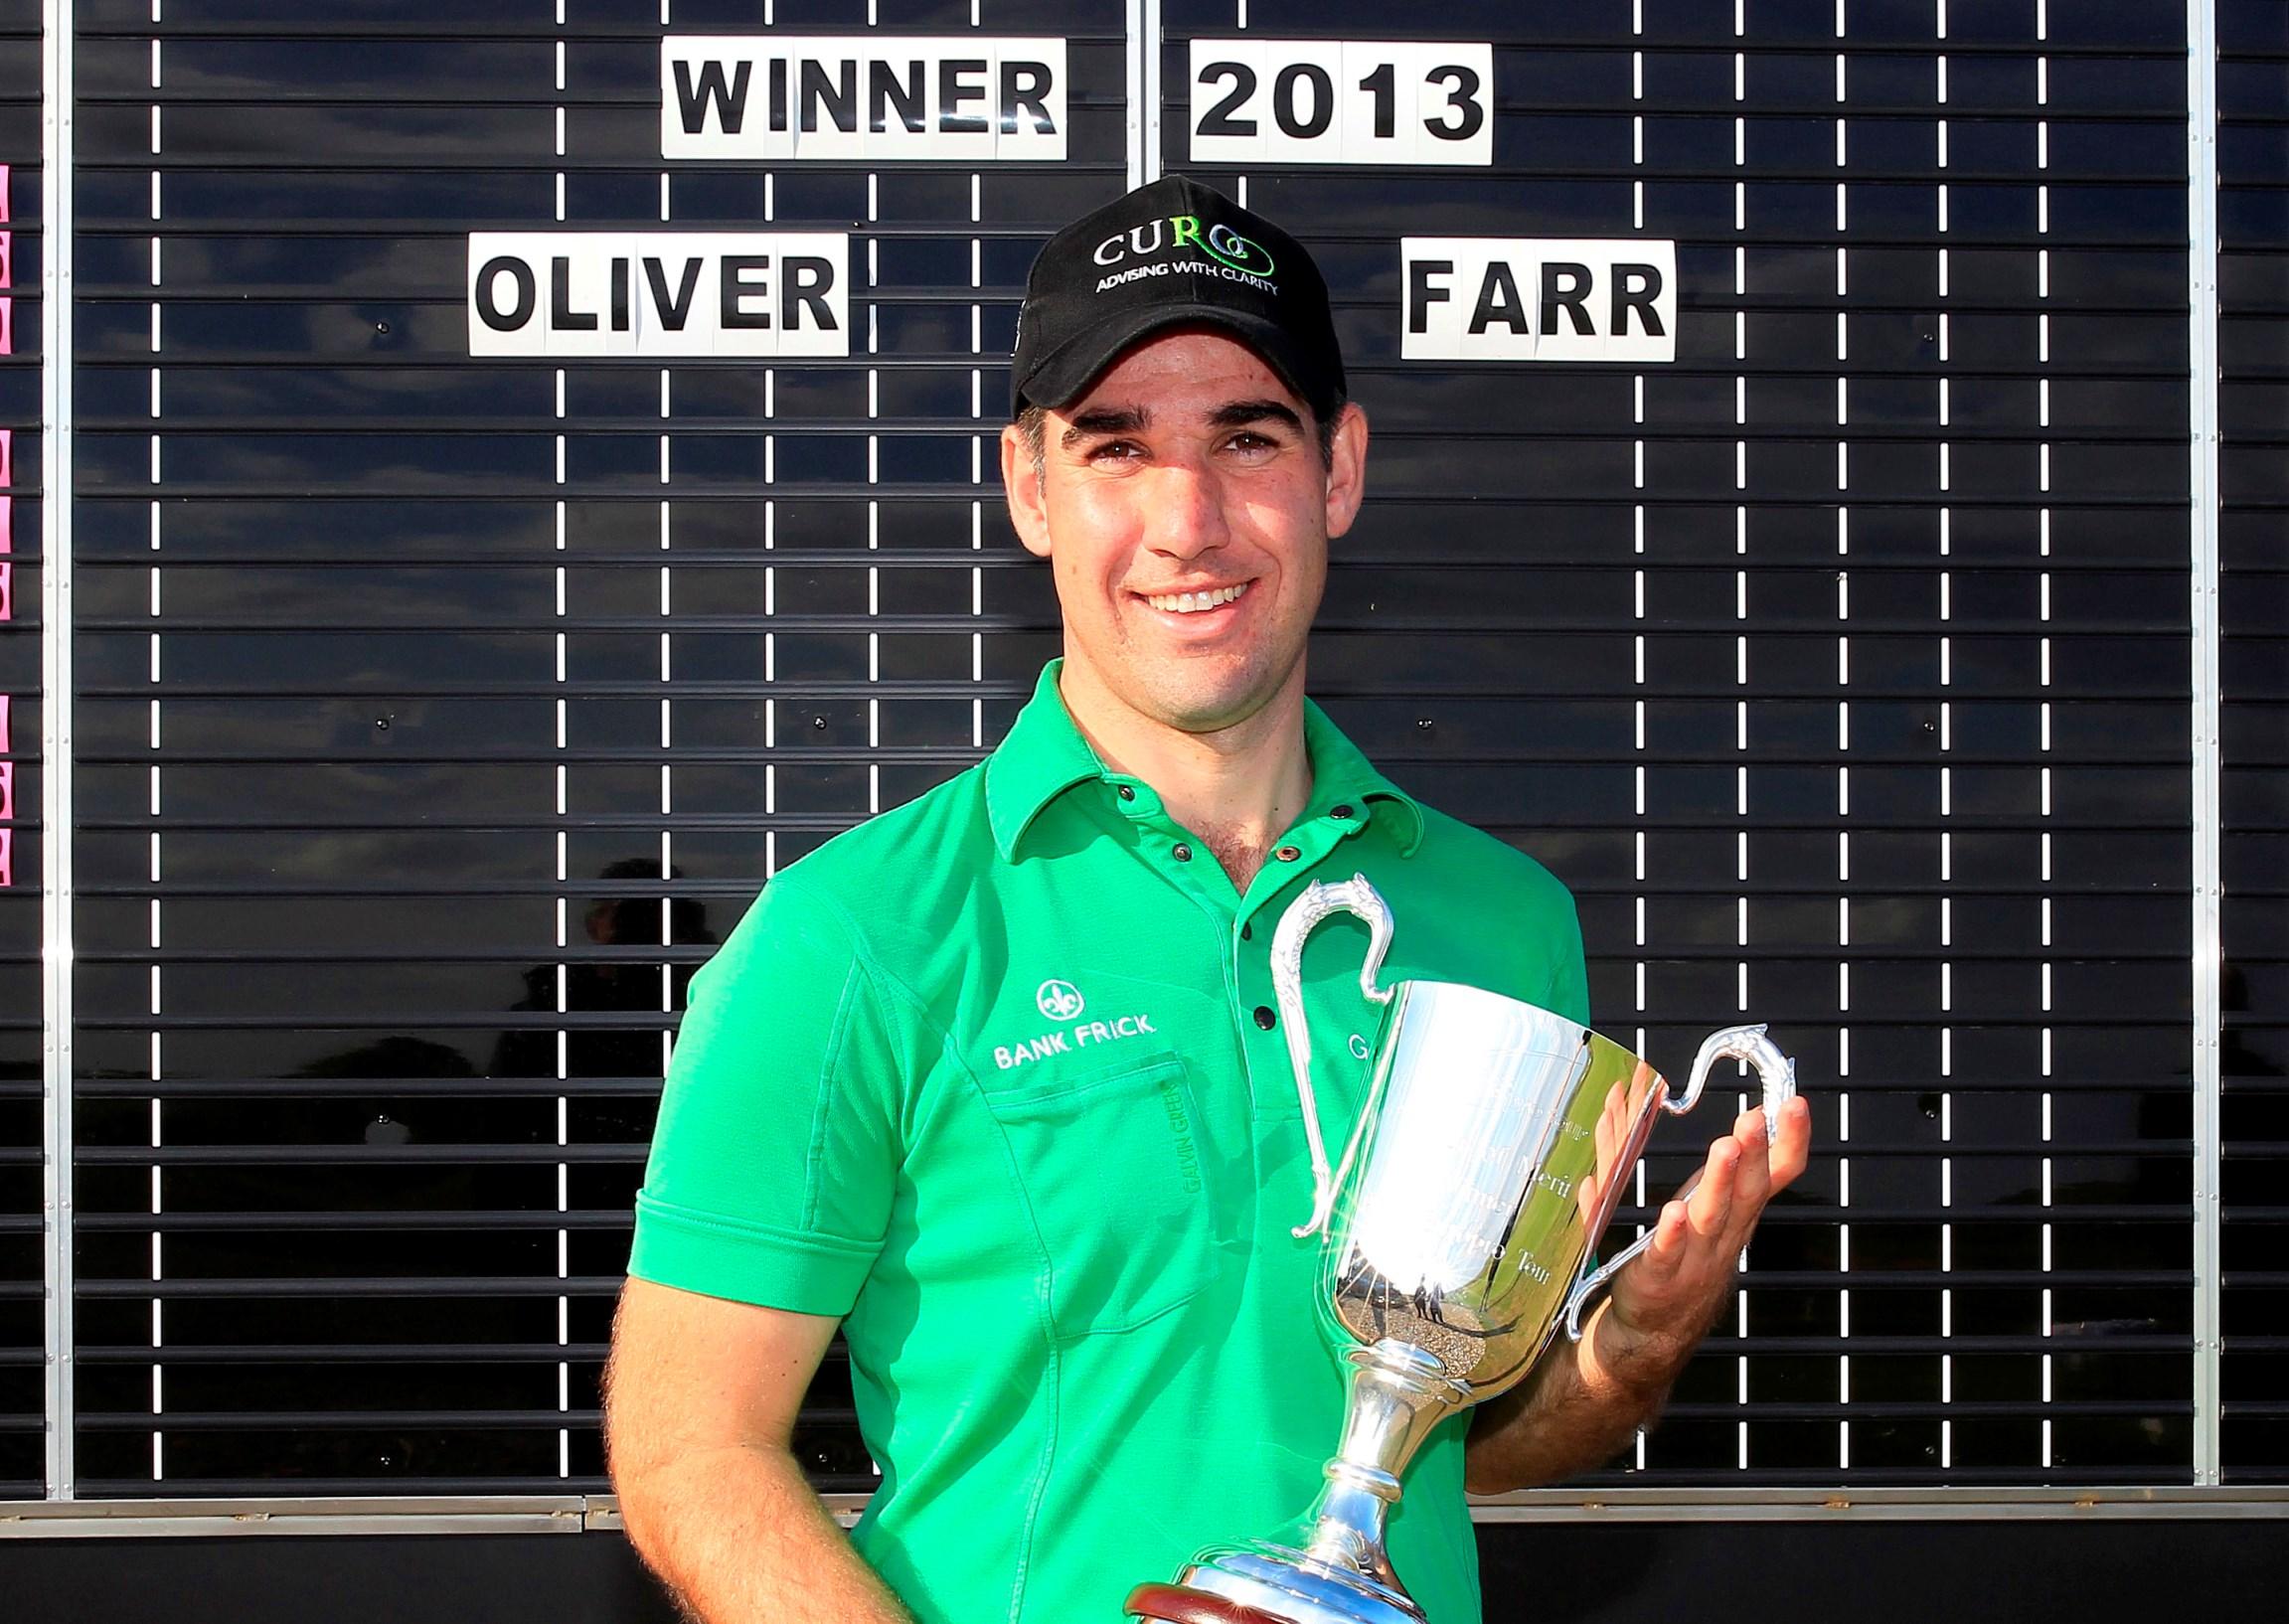 Congratulations Oliver Farr